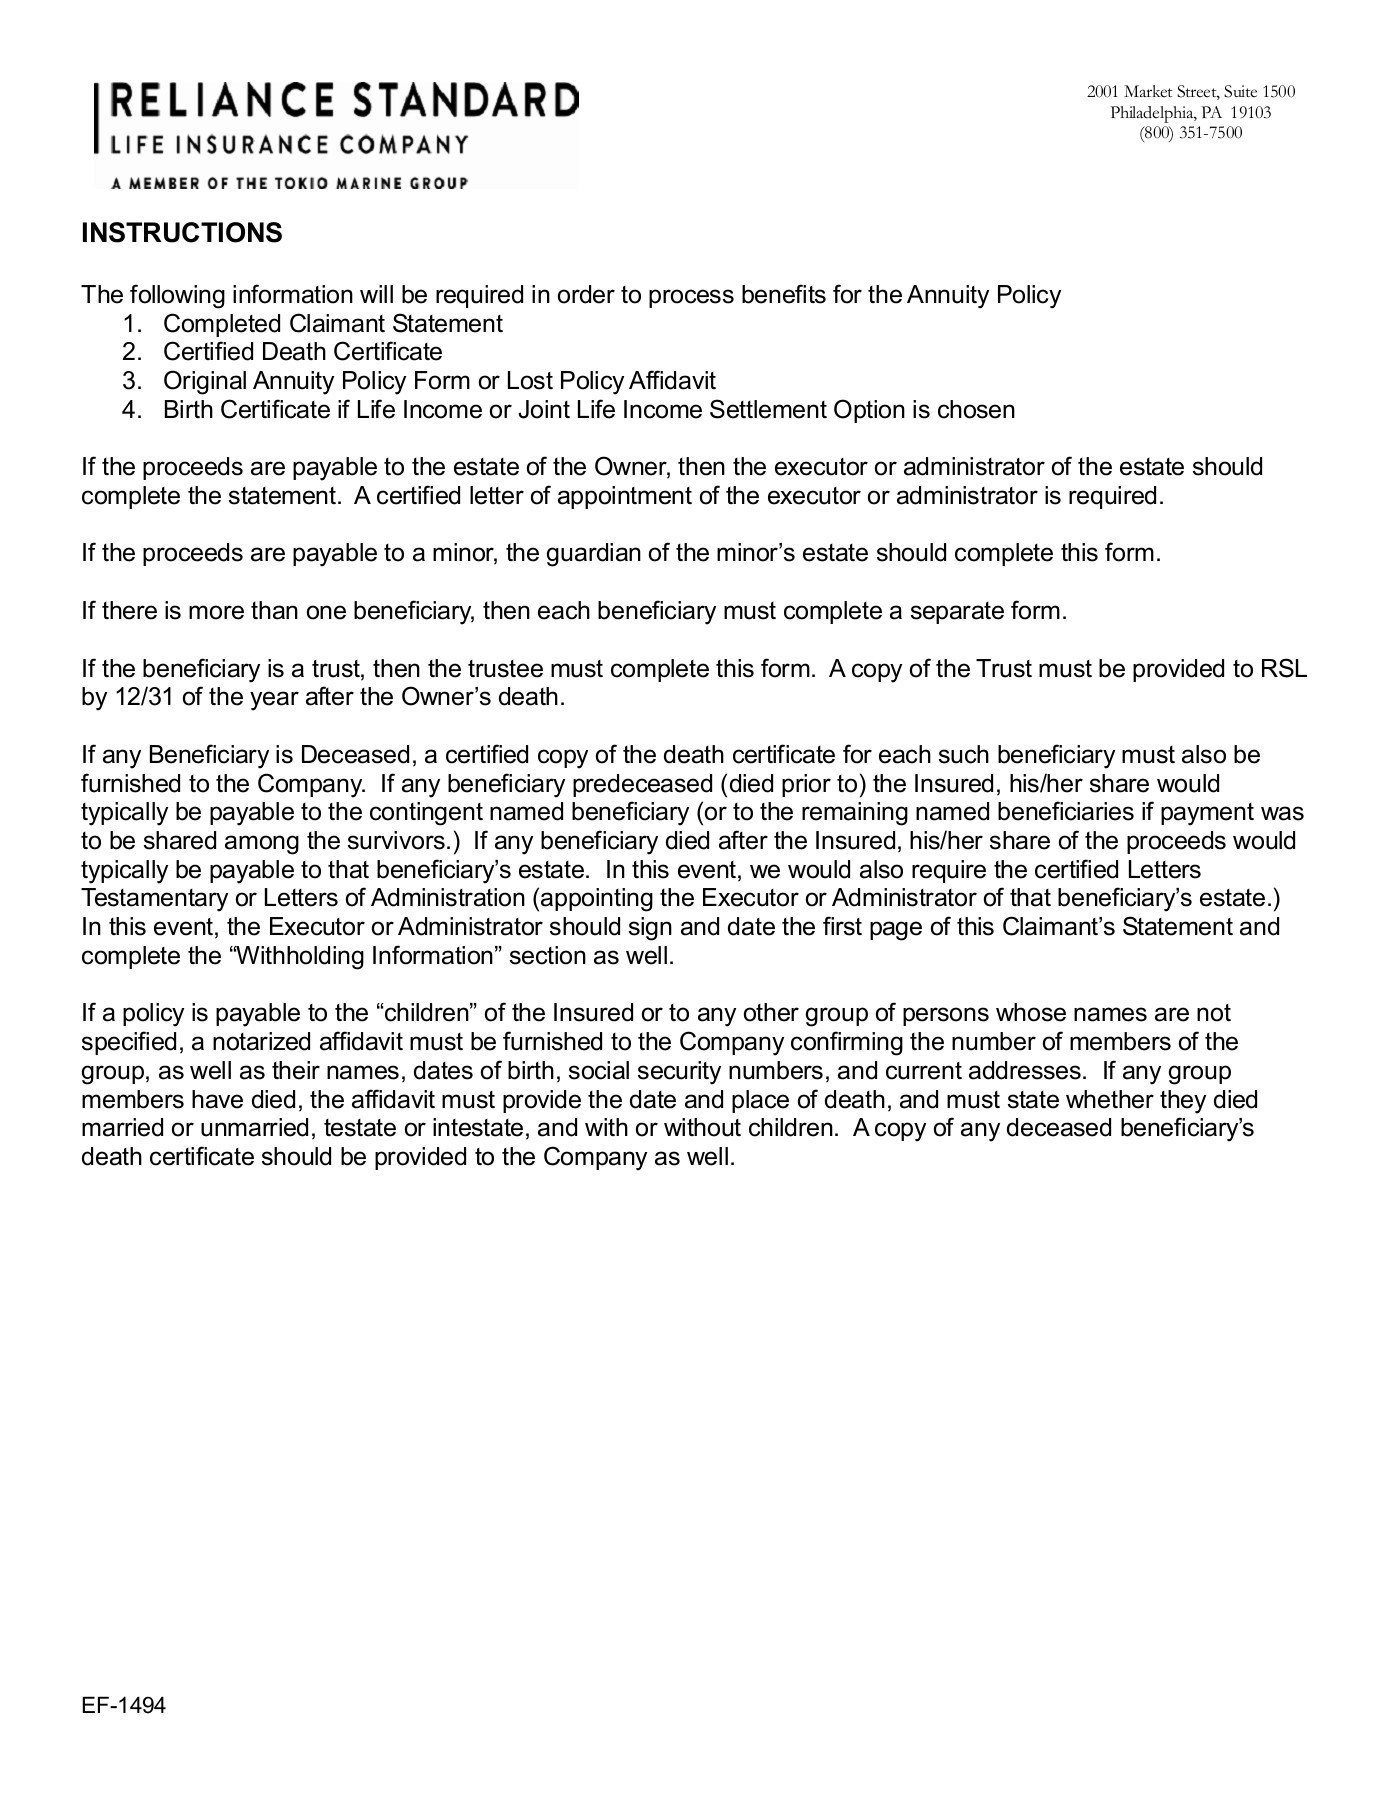 beneficiary designation predetermined settlement option